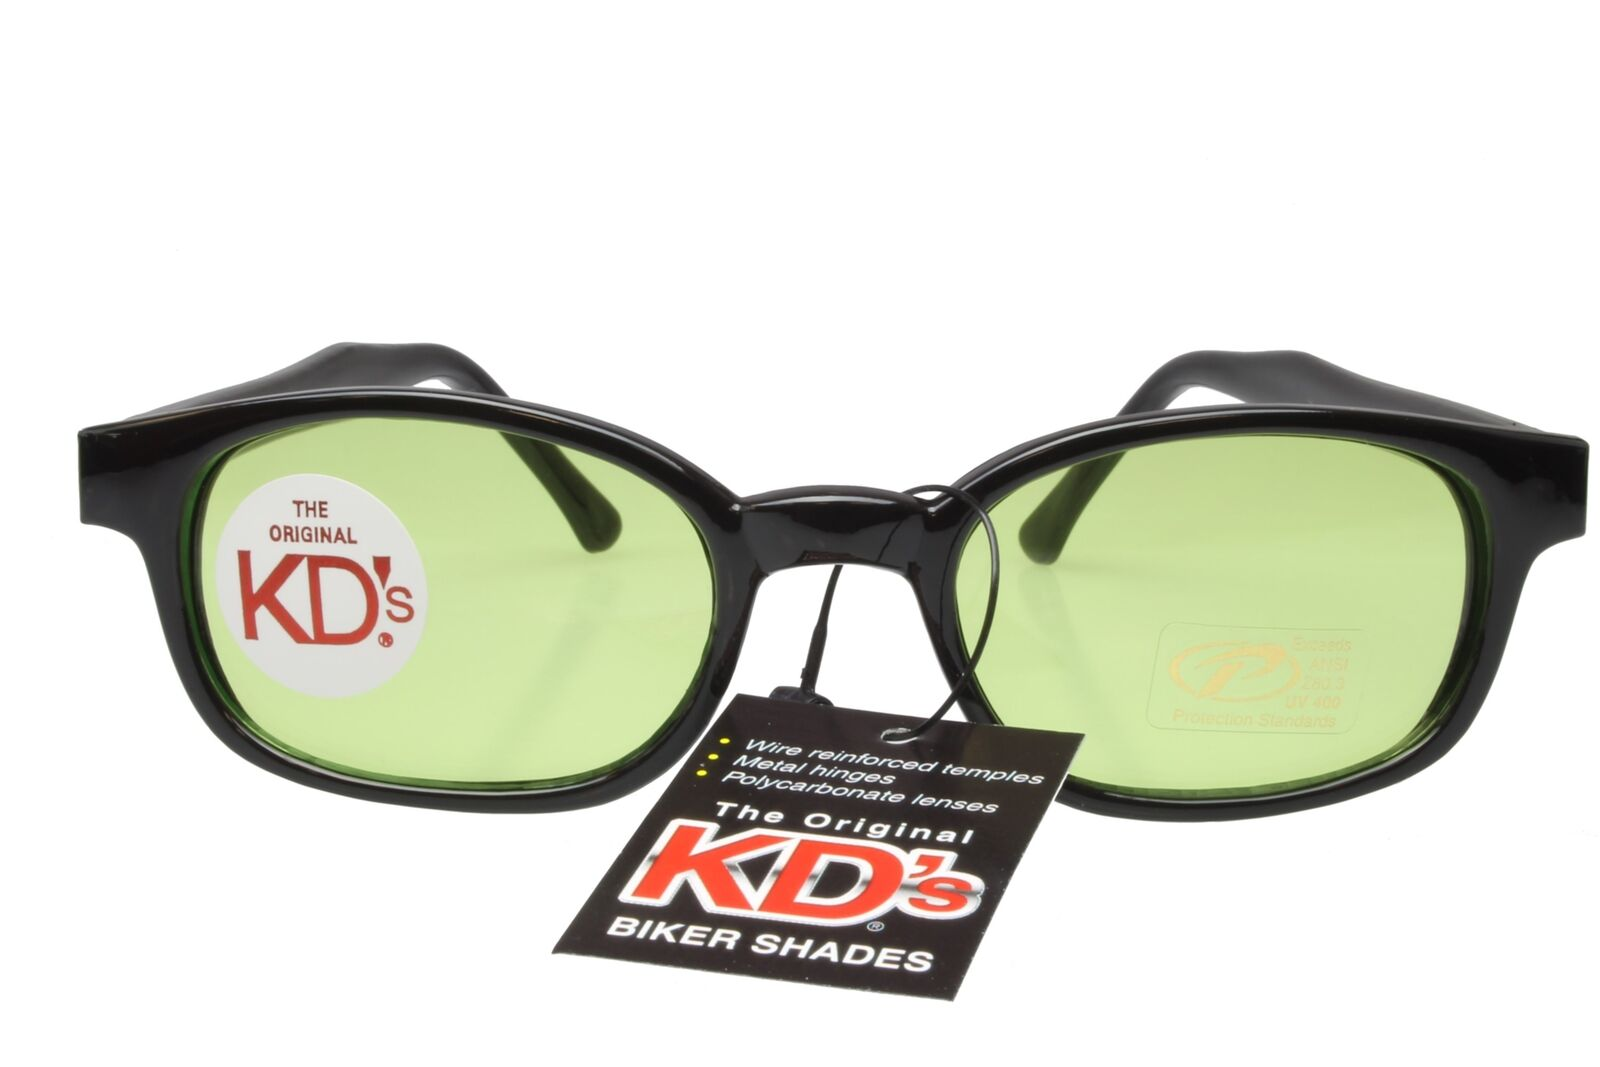 719b7bf96b Details about KD s Sunglasses Original Biker Shades Motorcycle Black Lt  Green Lens 2016